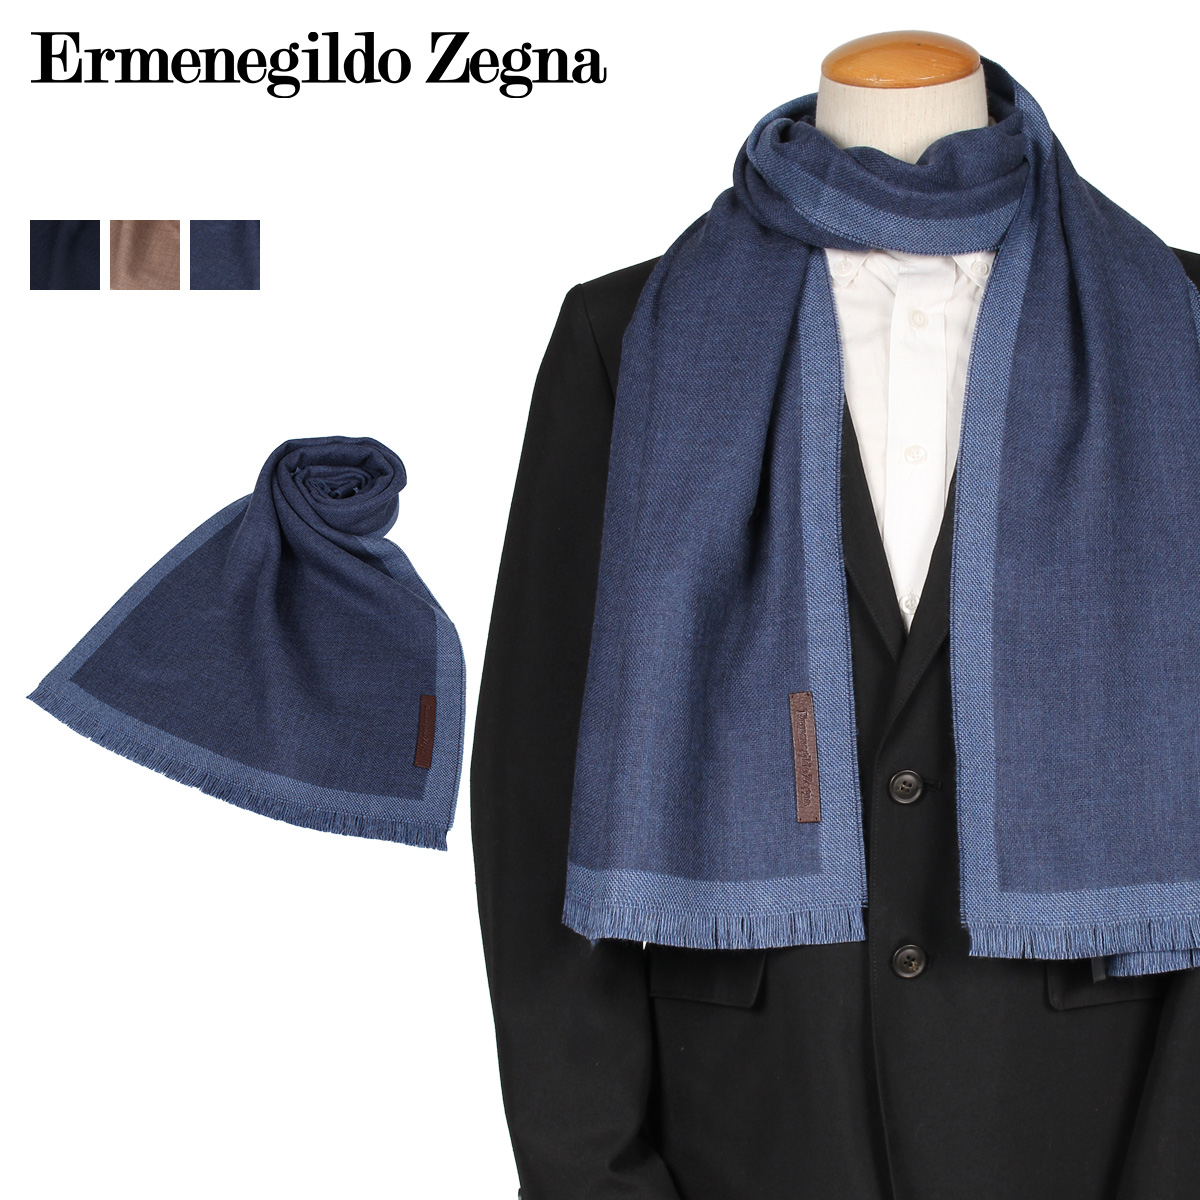 Ermenegildo Zegna MUFFLER エルメネジルドゼニア マフラー メンズ ウール ネイビー ブラウン ブルー Z6L01